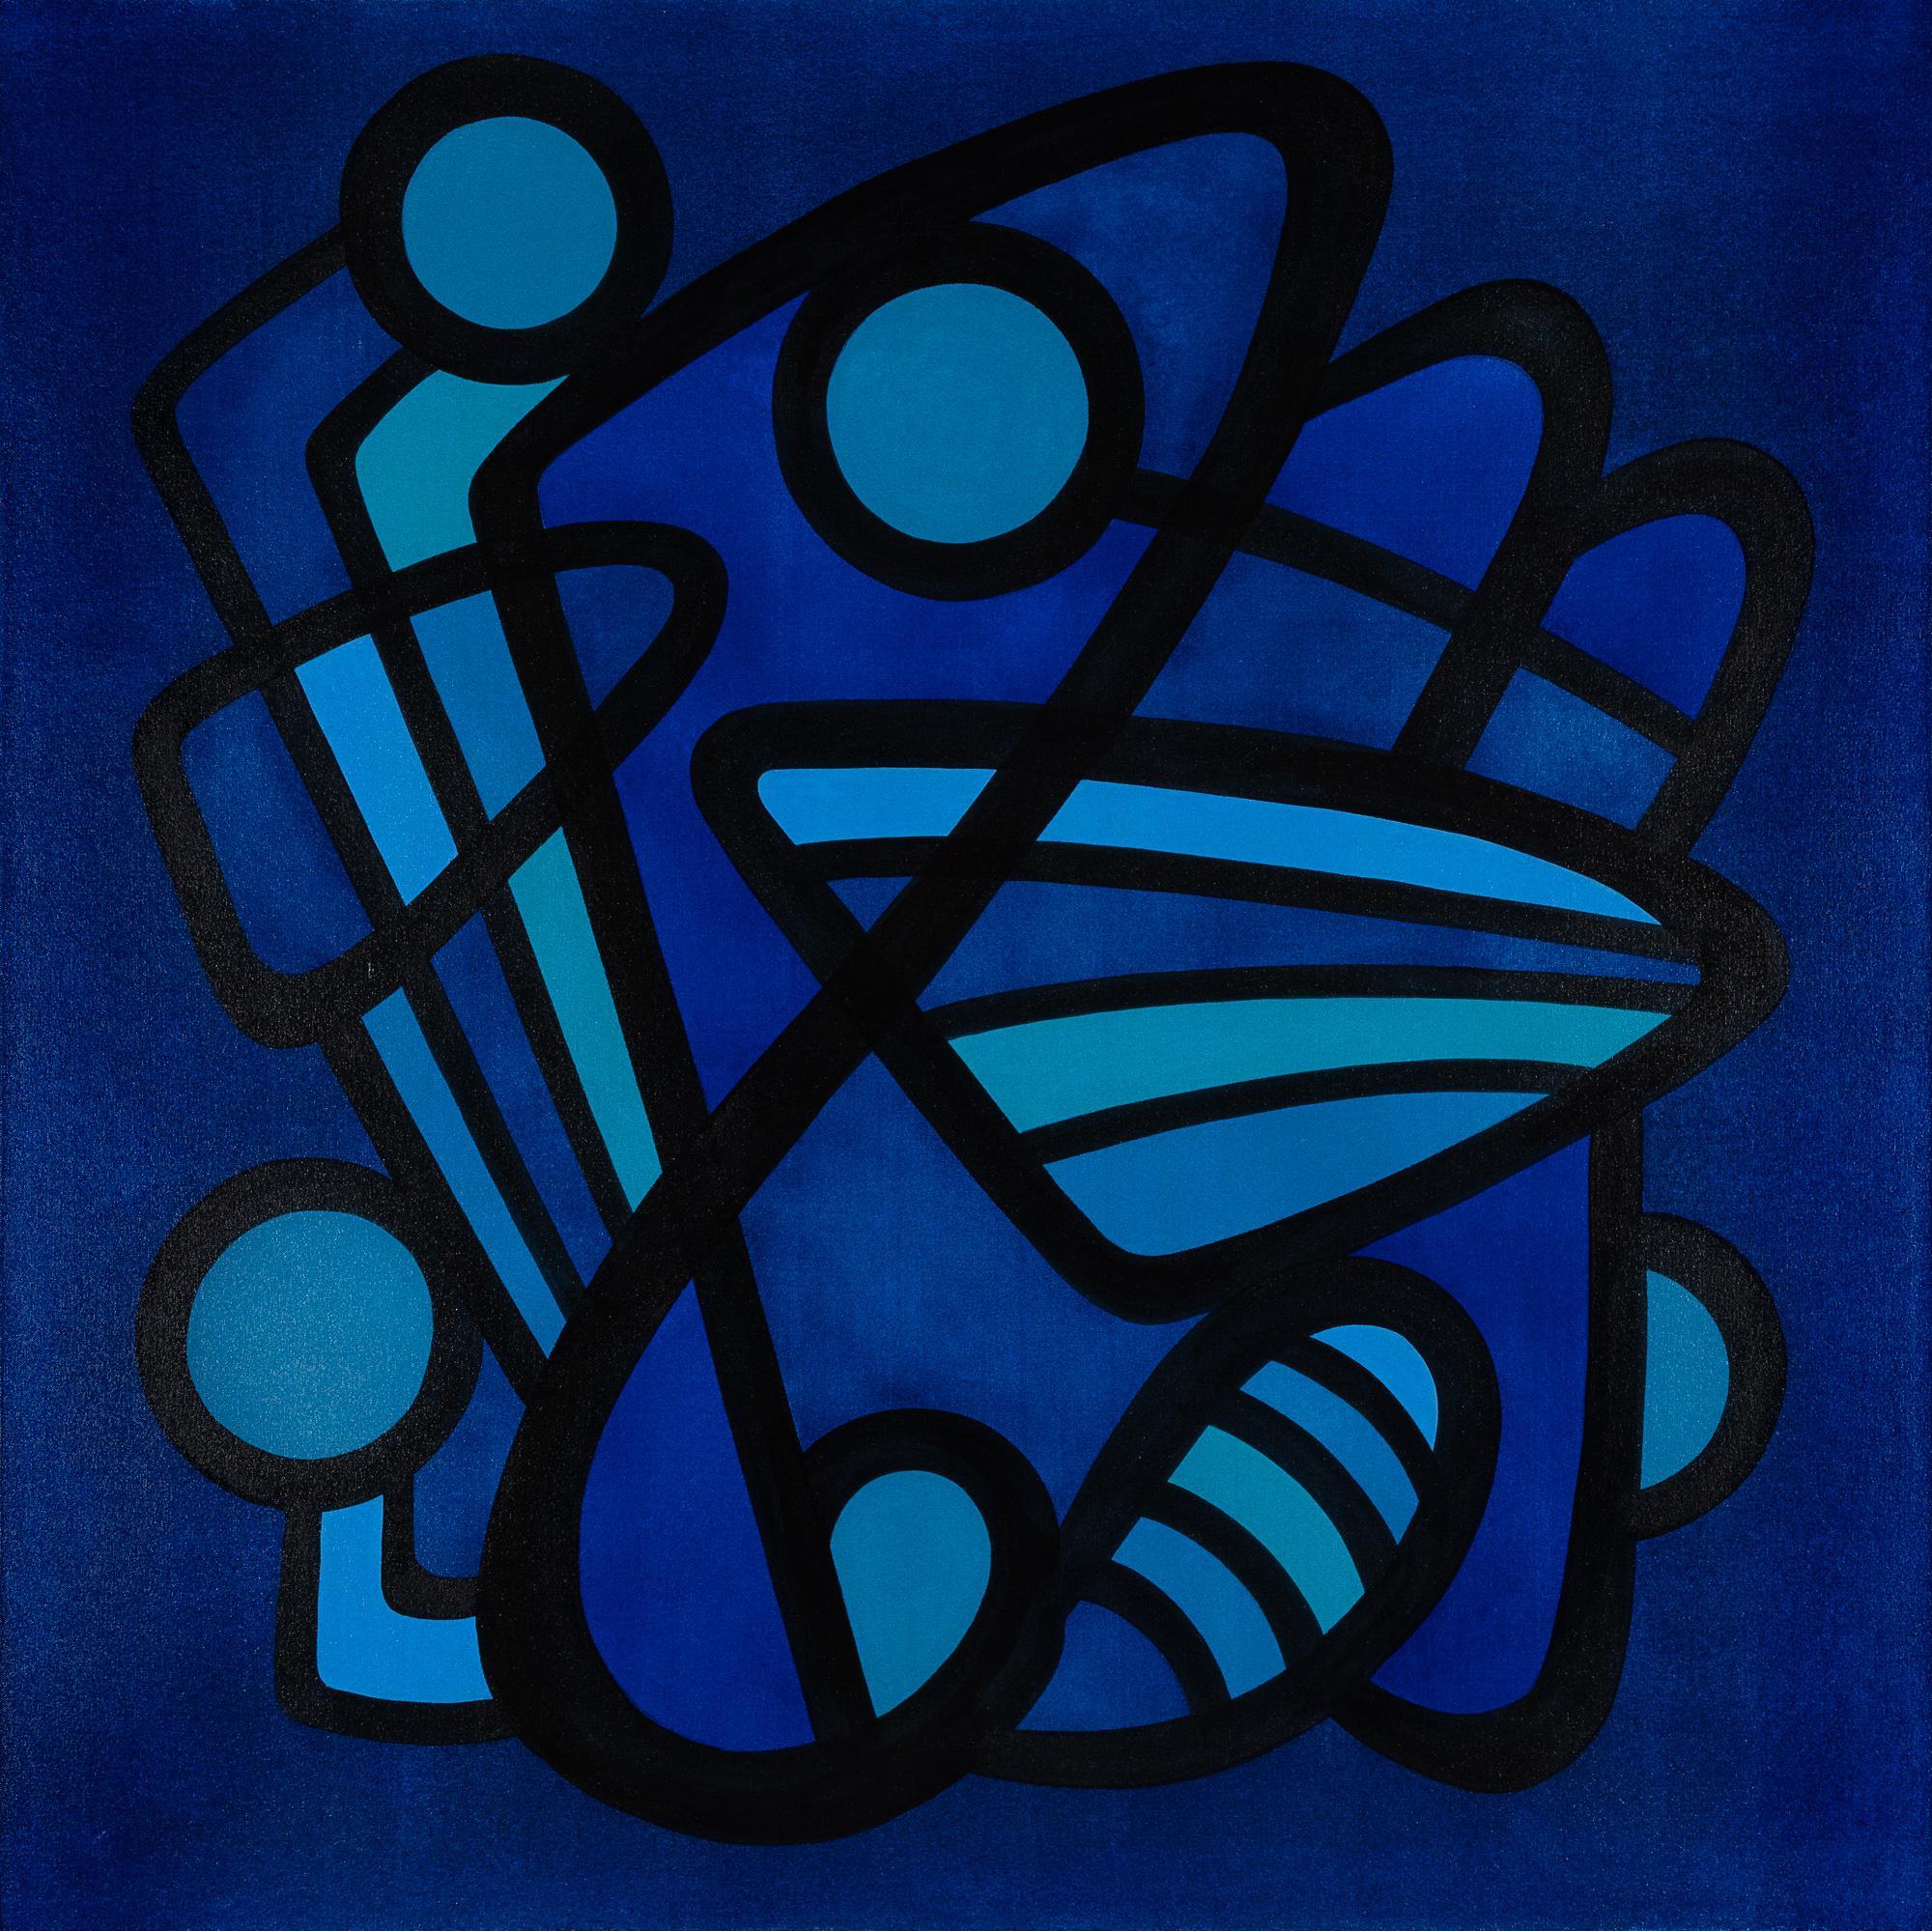 BARANADA BLUES #6 - blue geometric abstraction